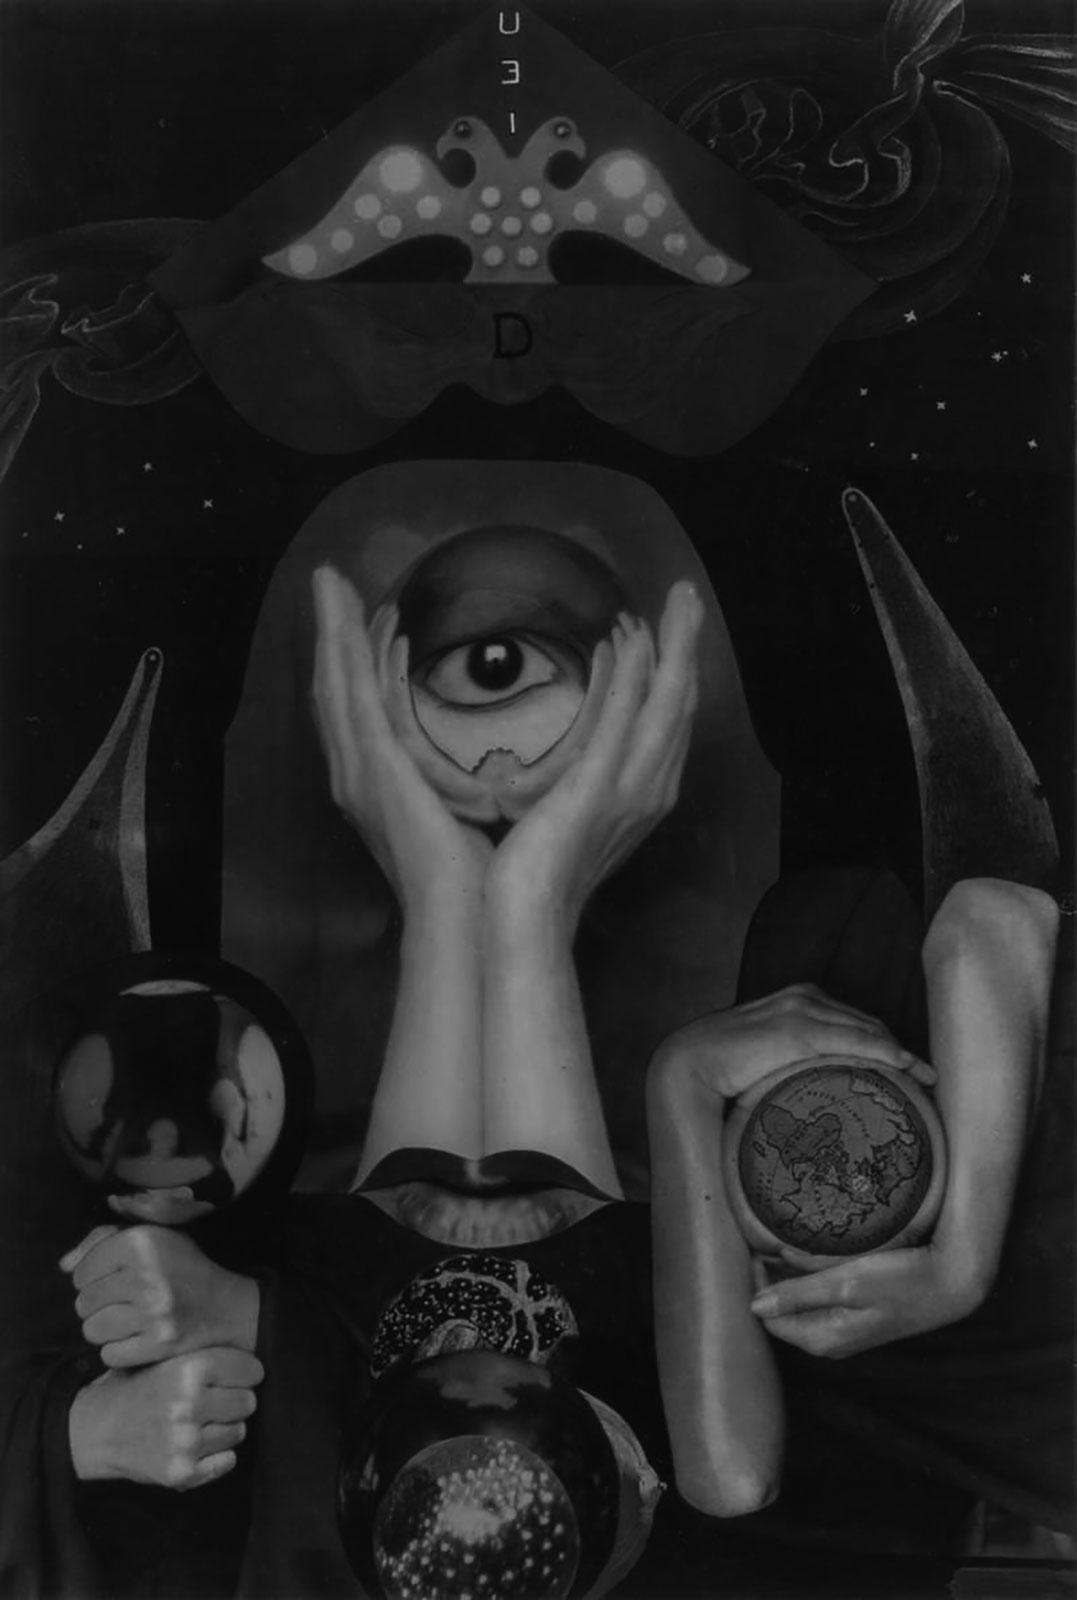 Collage de l'artiste Claude Cahun